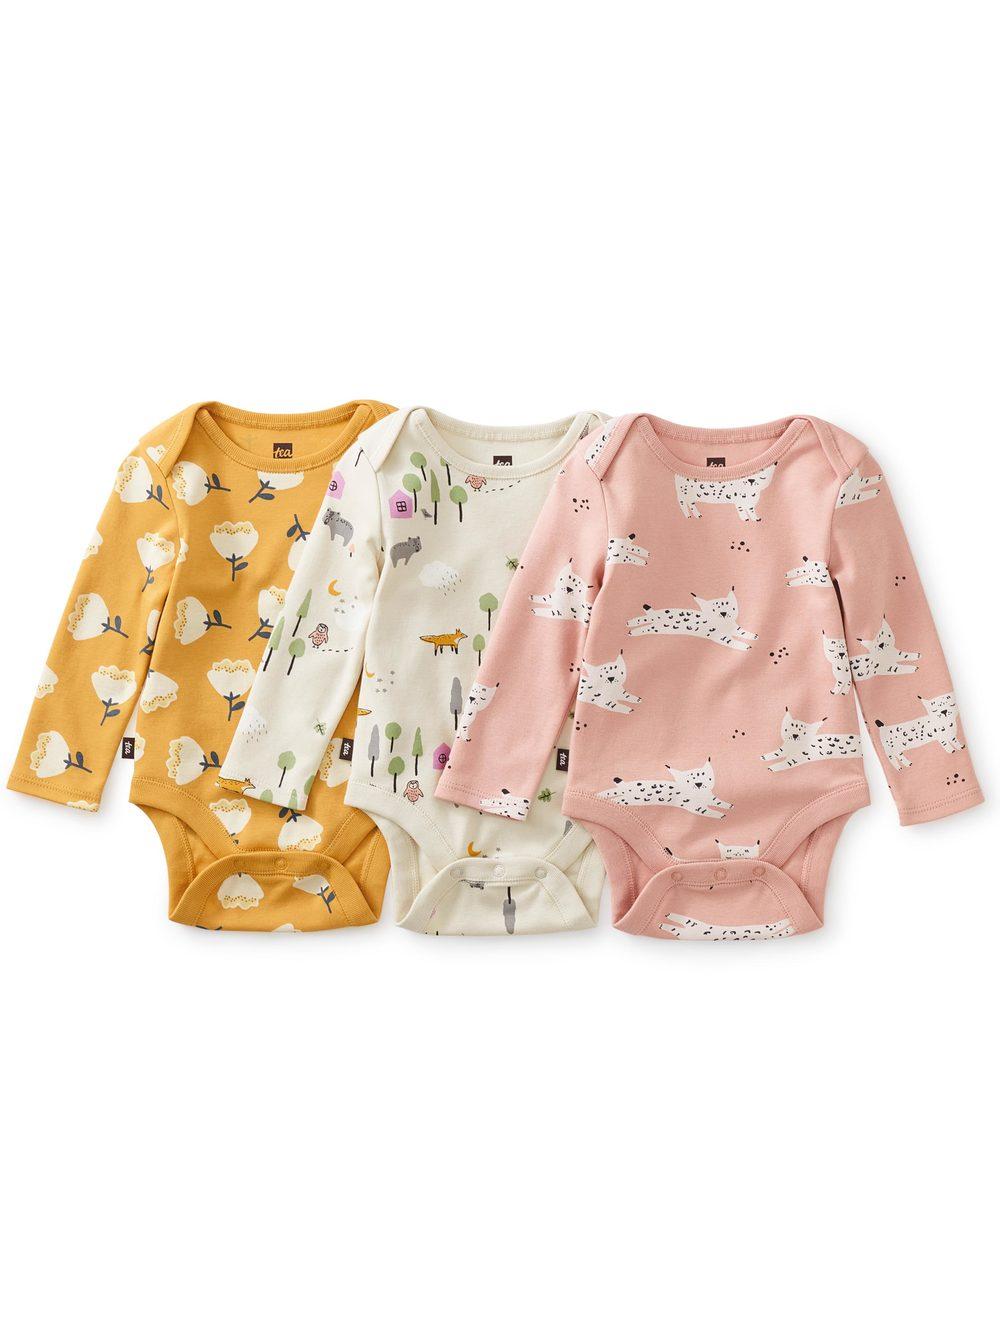 Baby Bodysuit Set